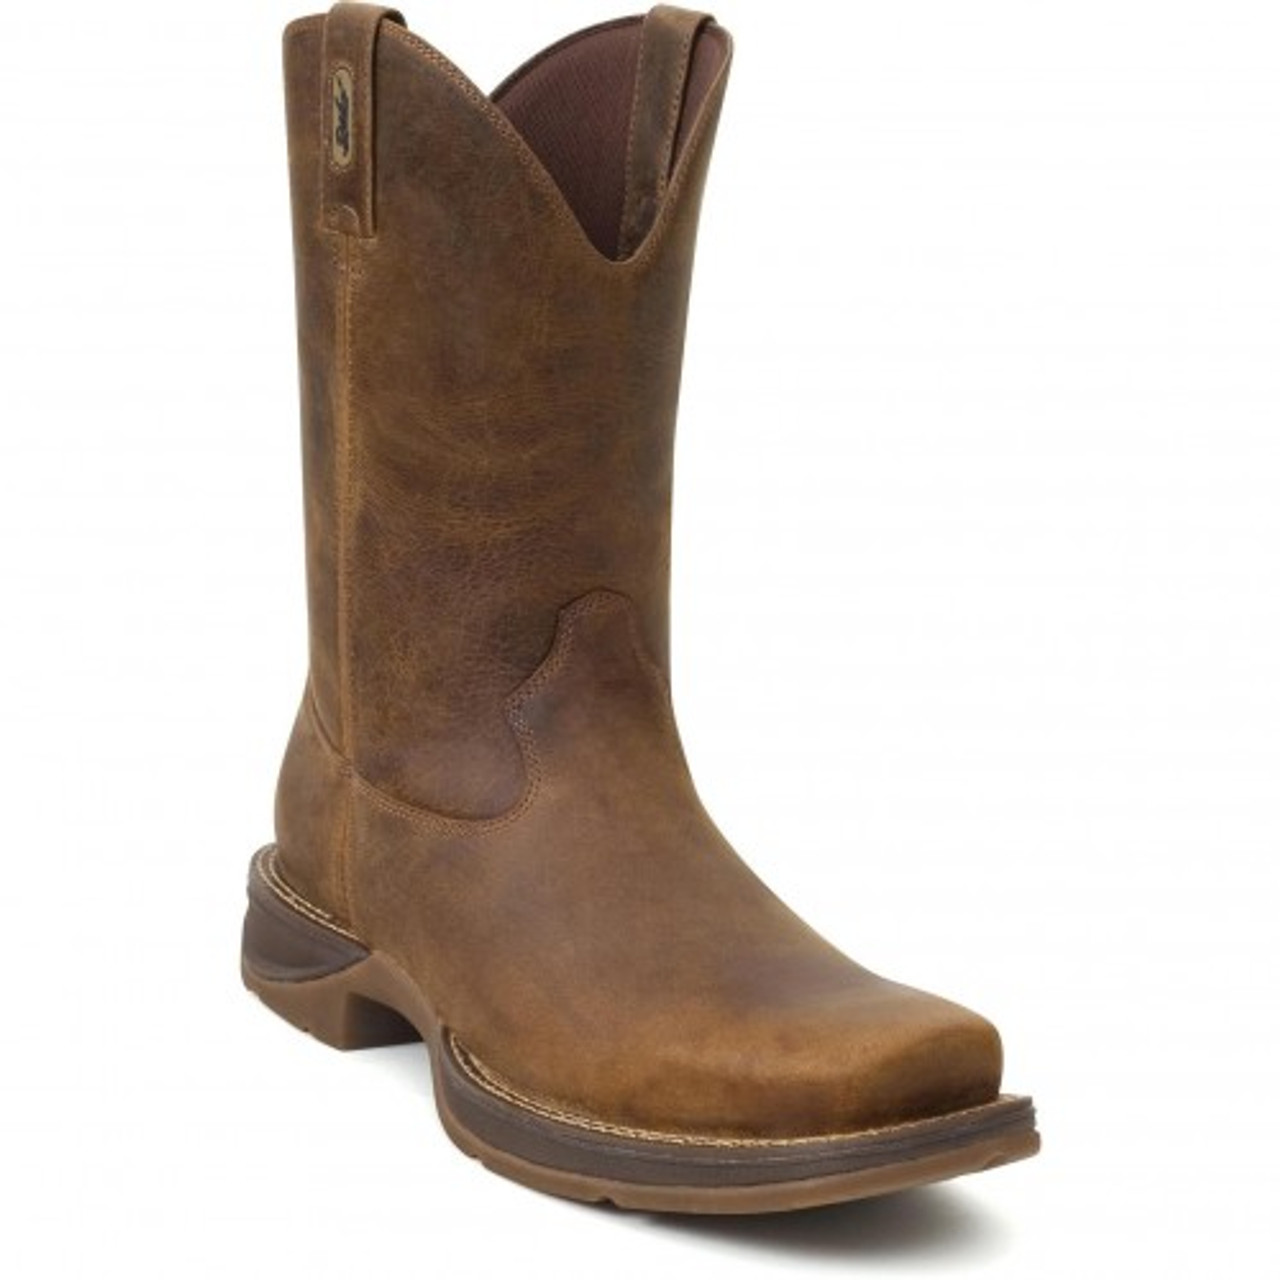 81ab04c254d Durango Men's Boots - Rebel - Brown Pull-On